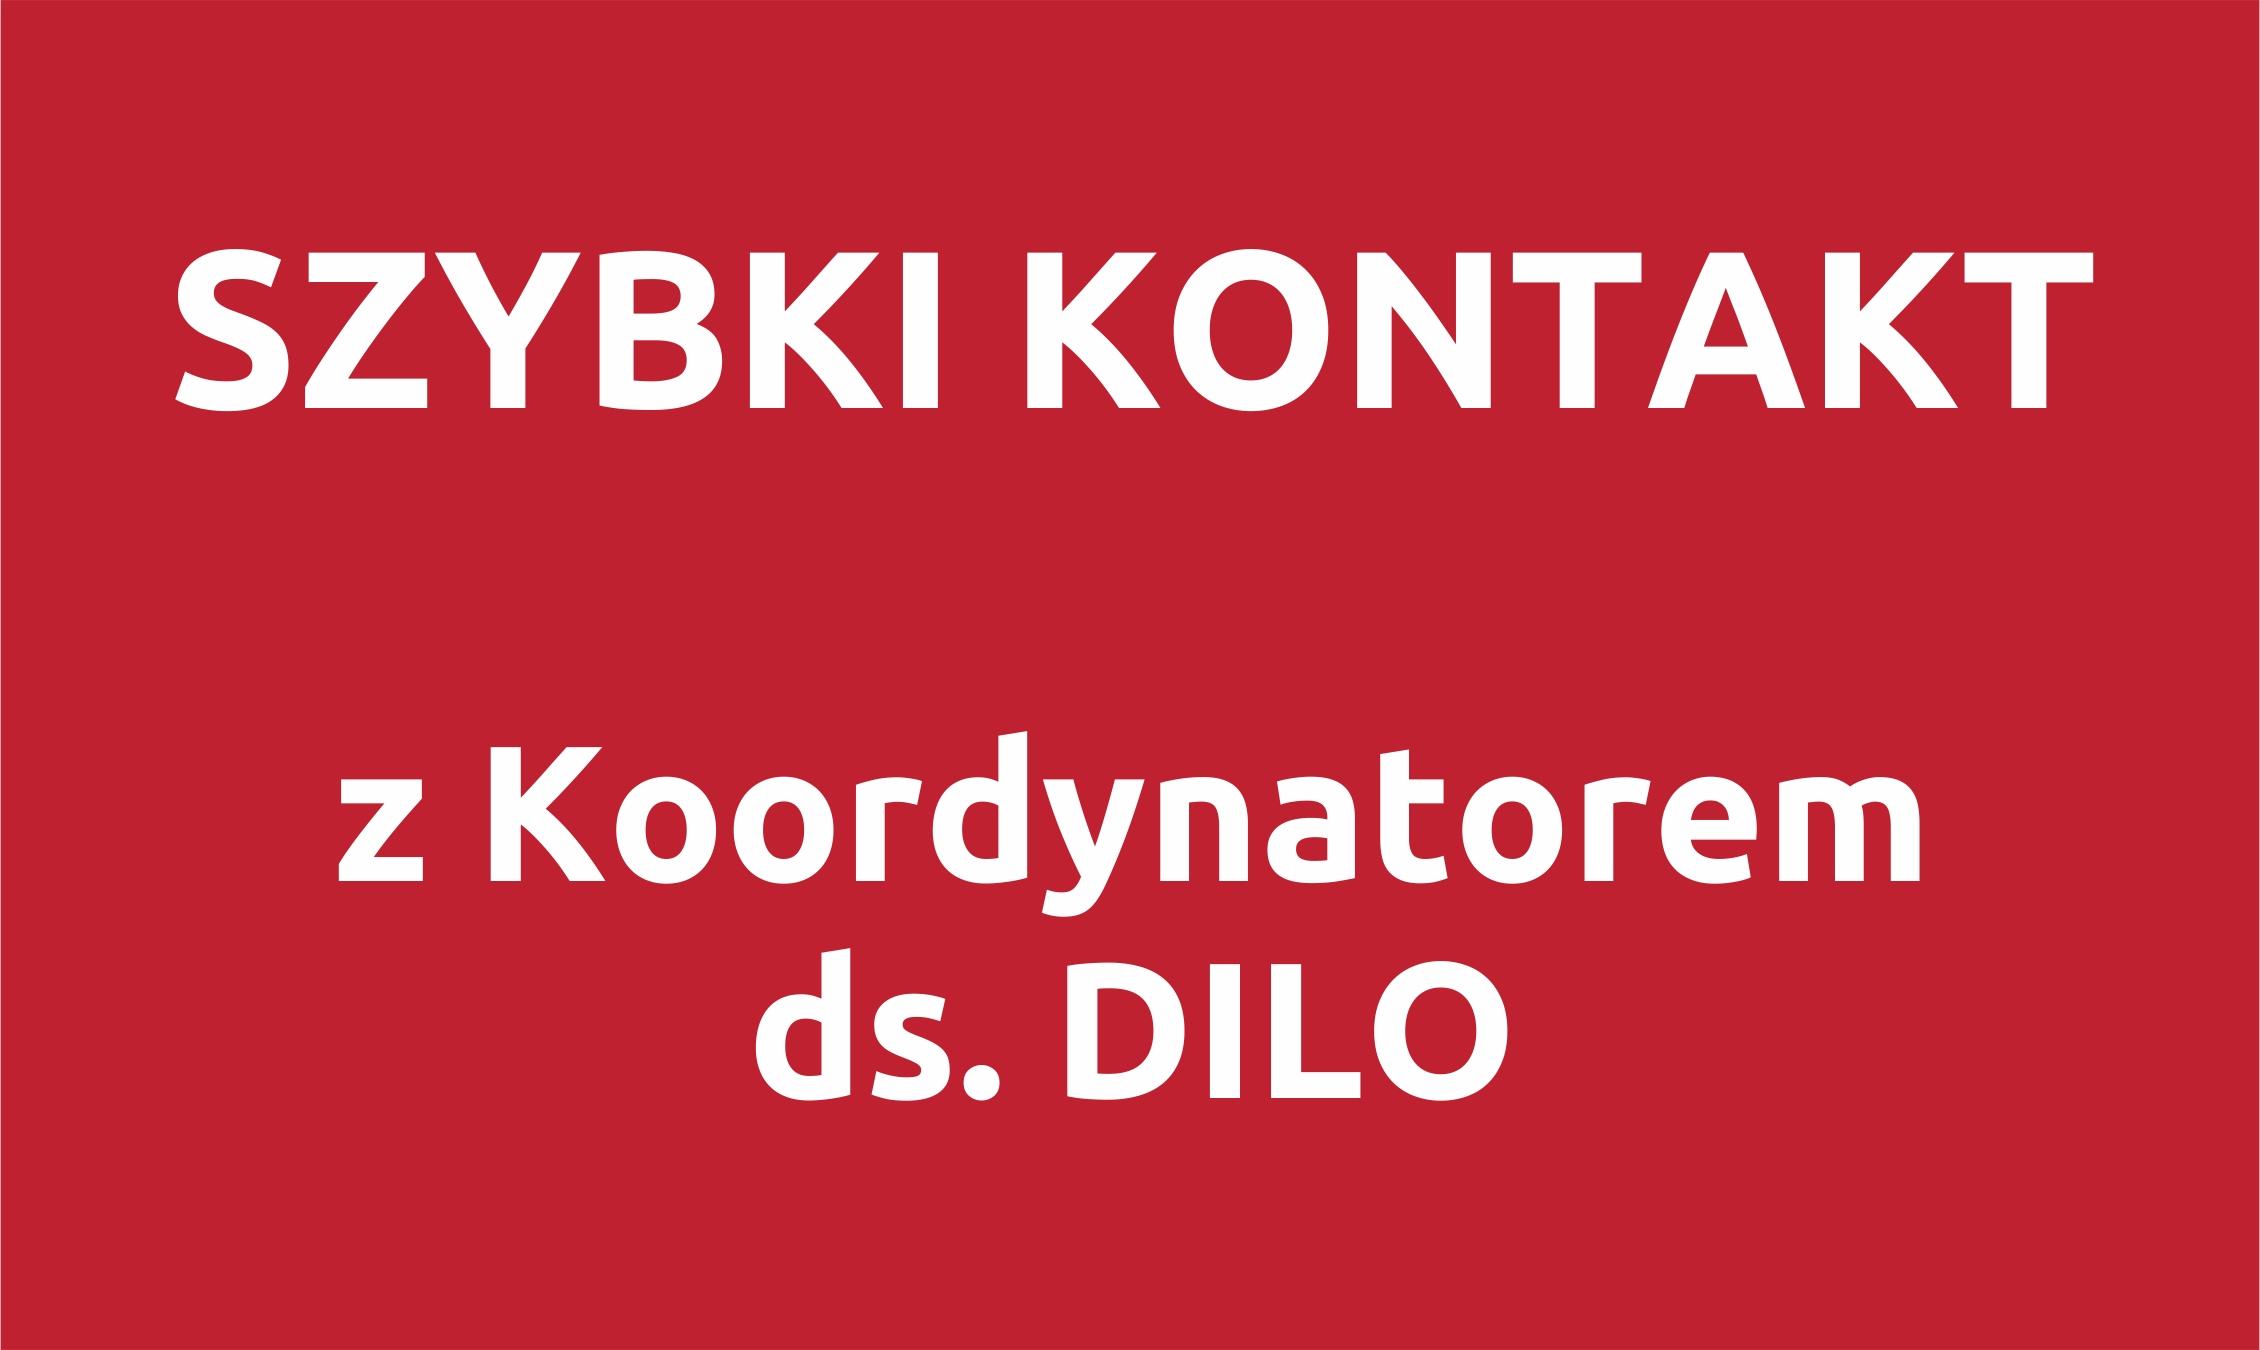 Koordynator ds. DILO